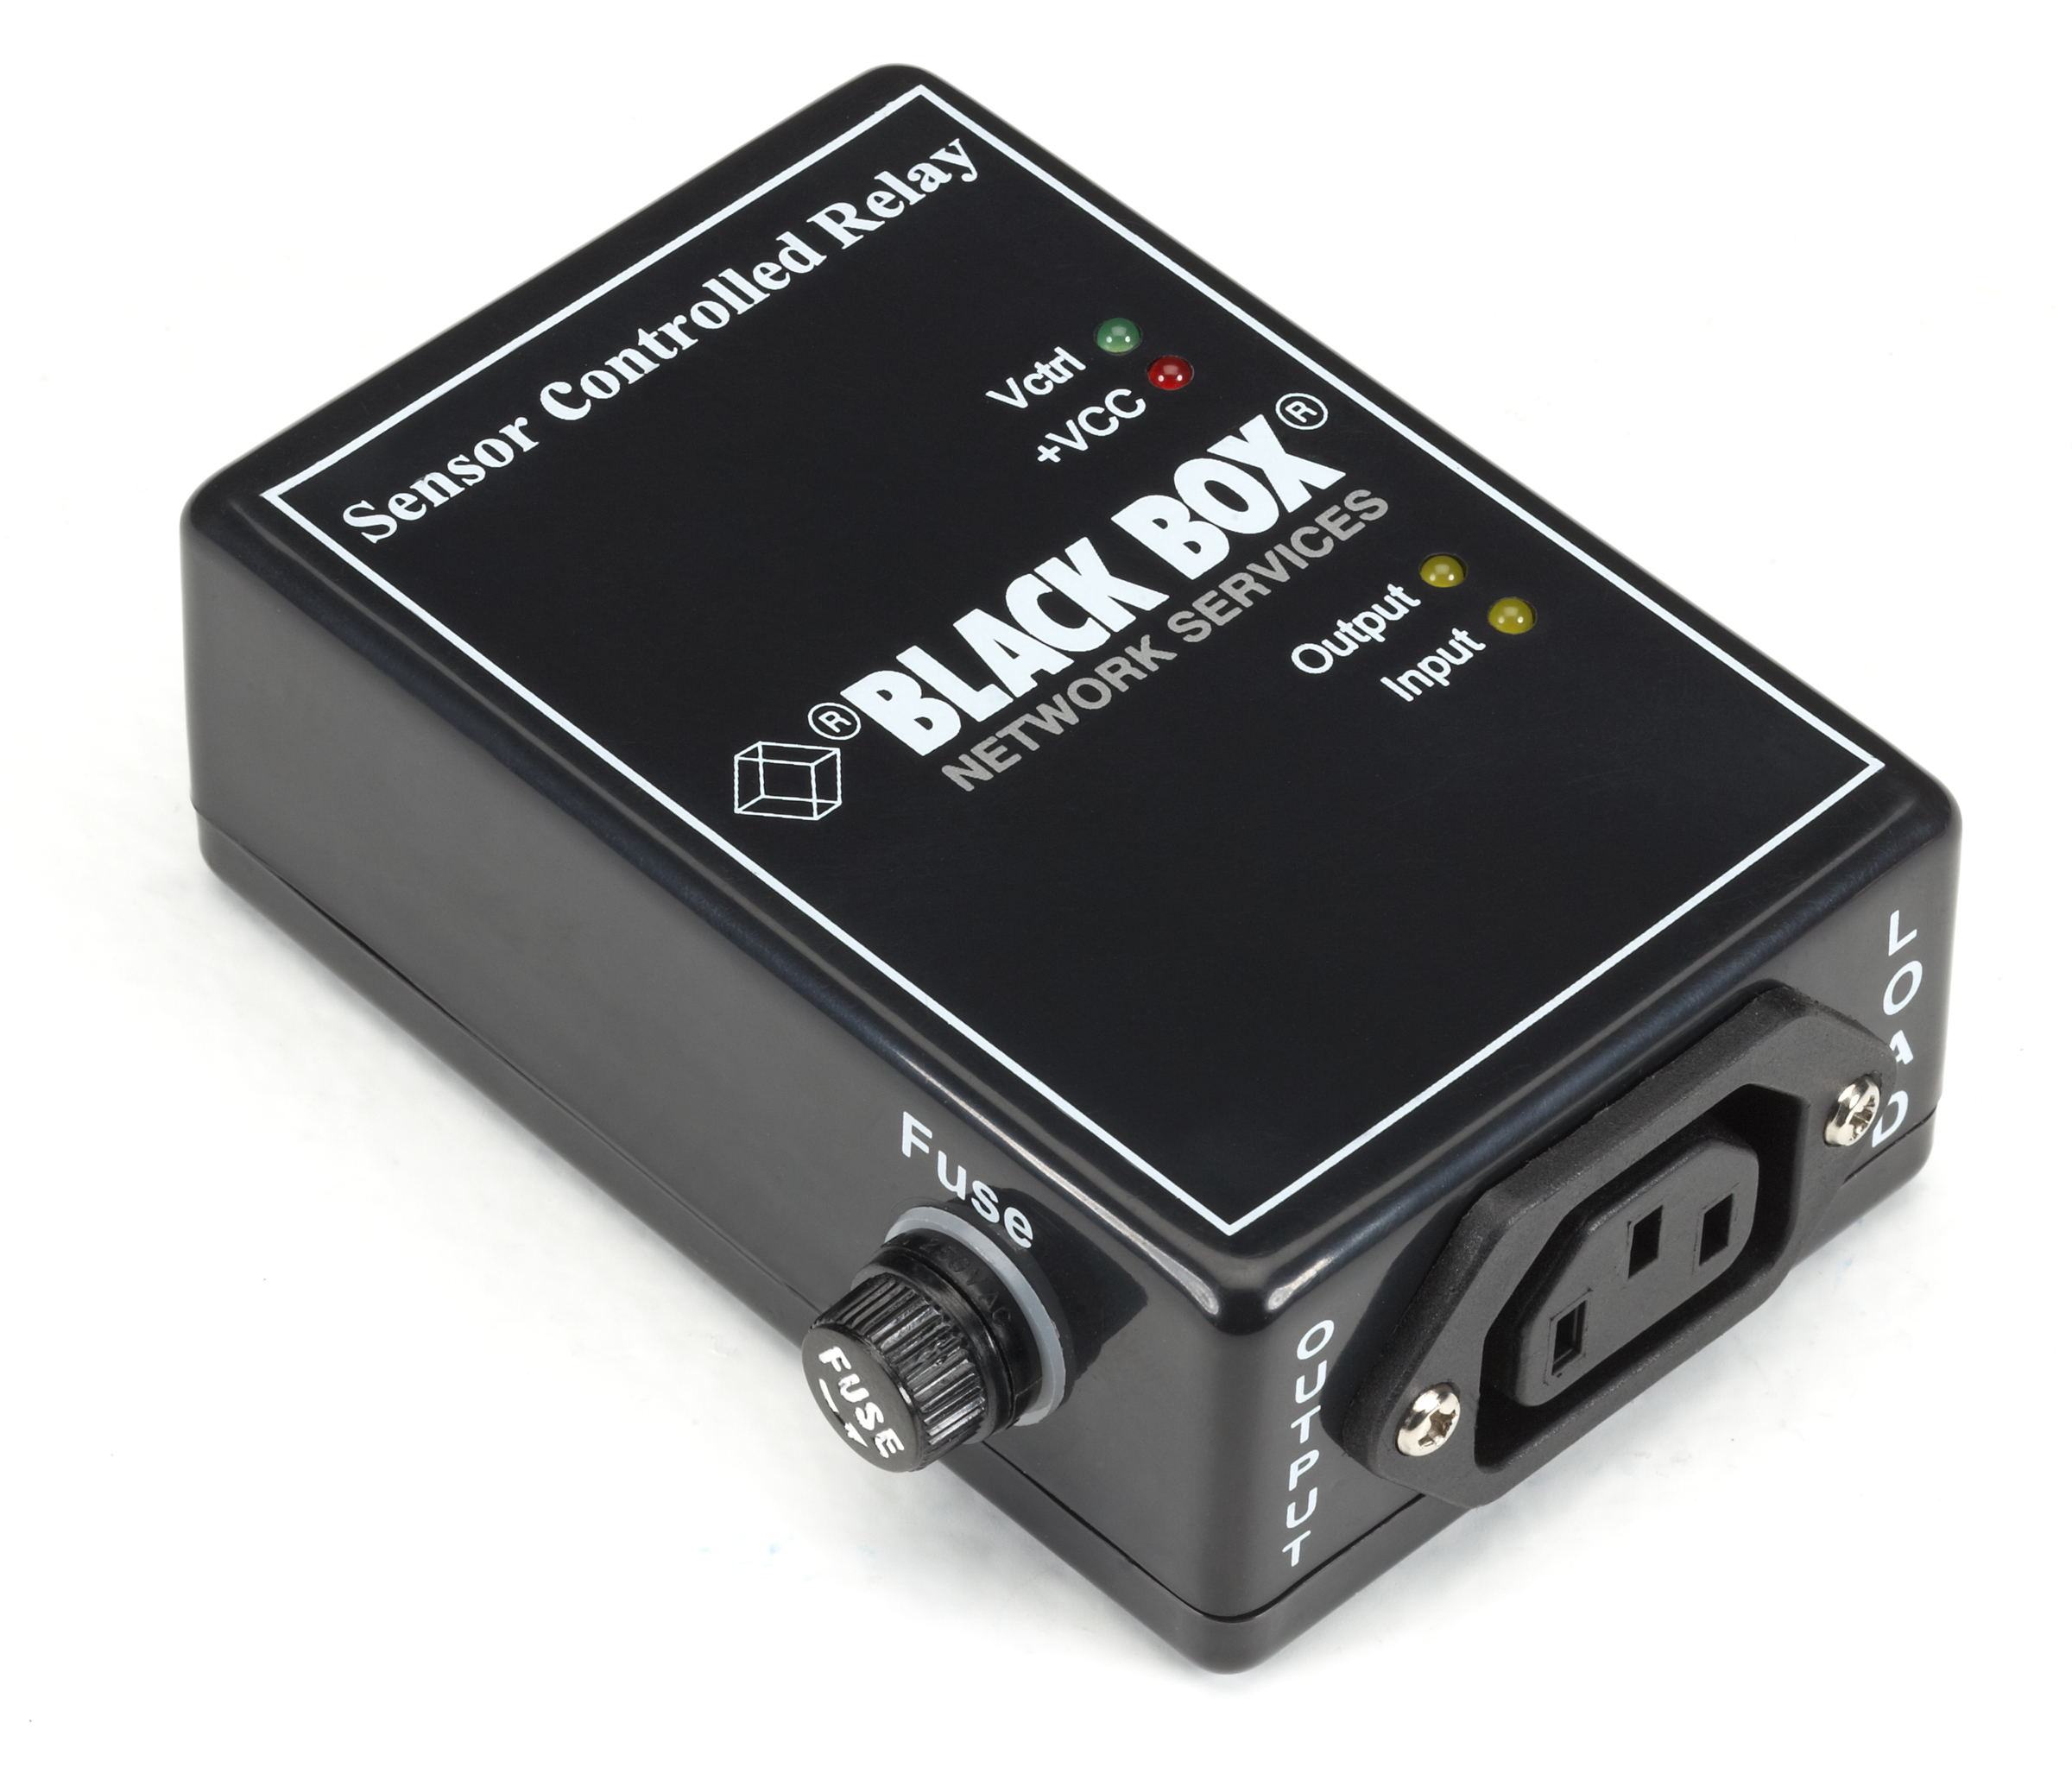 AlertWerks Power Switch 220V Normally Closed | Black Box